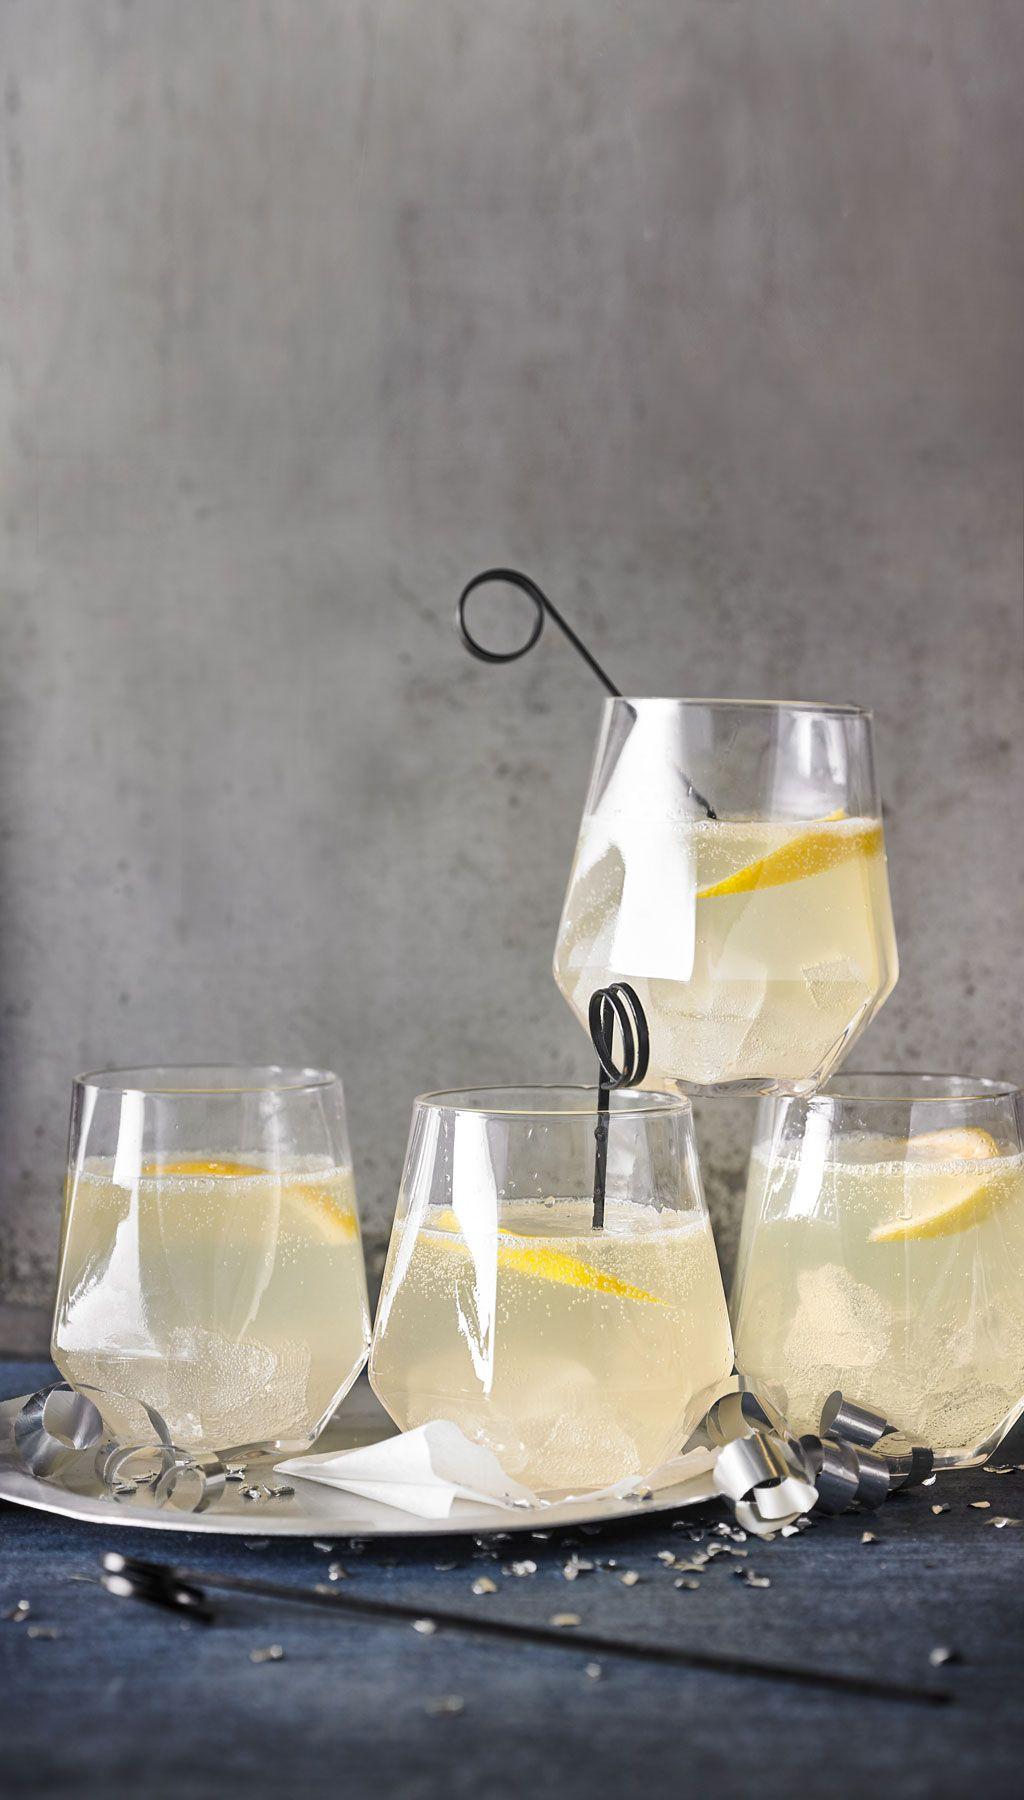 gin fizz in 2019 erfrischende drinks gin getr nke gin. Black Bedroom Furniture Sets. Home Design Ideas